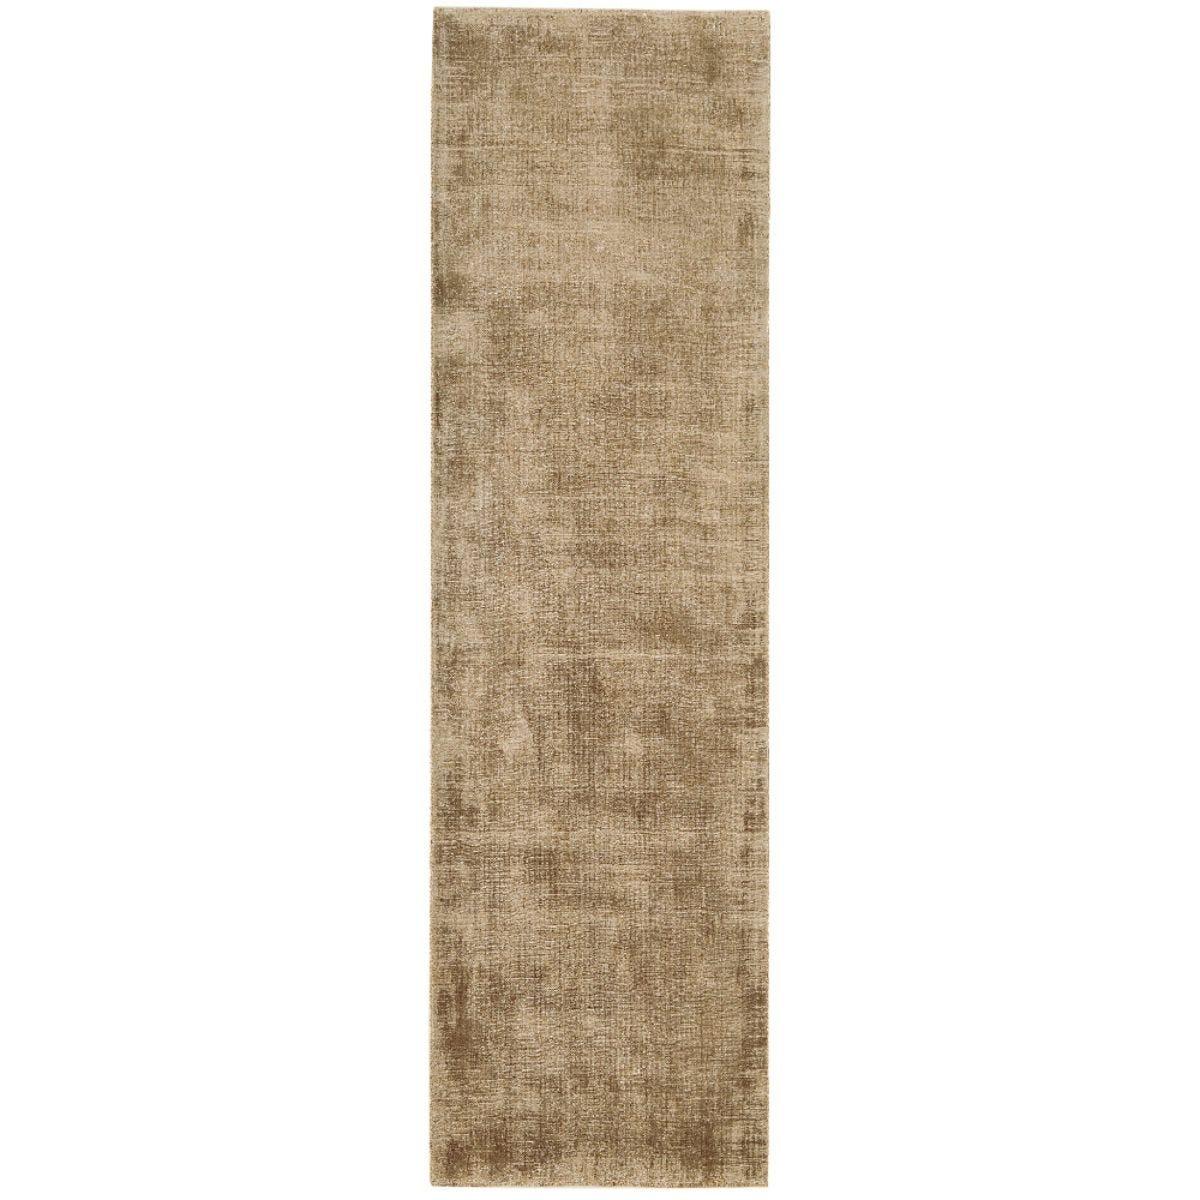 Asiatic Blade Runner, 240 x 66cm - Mocha